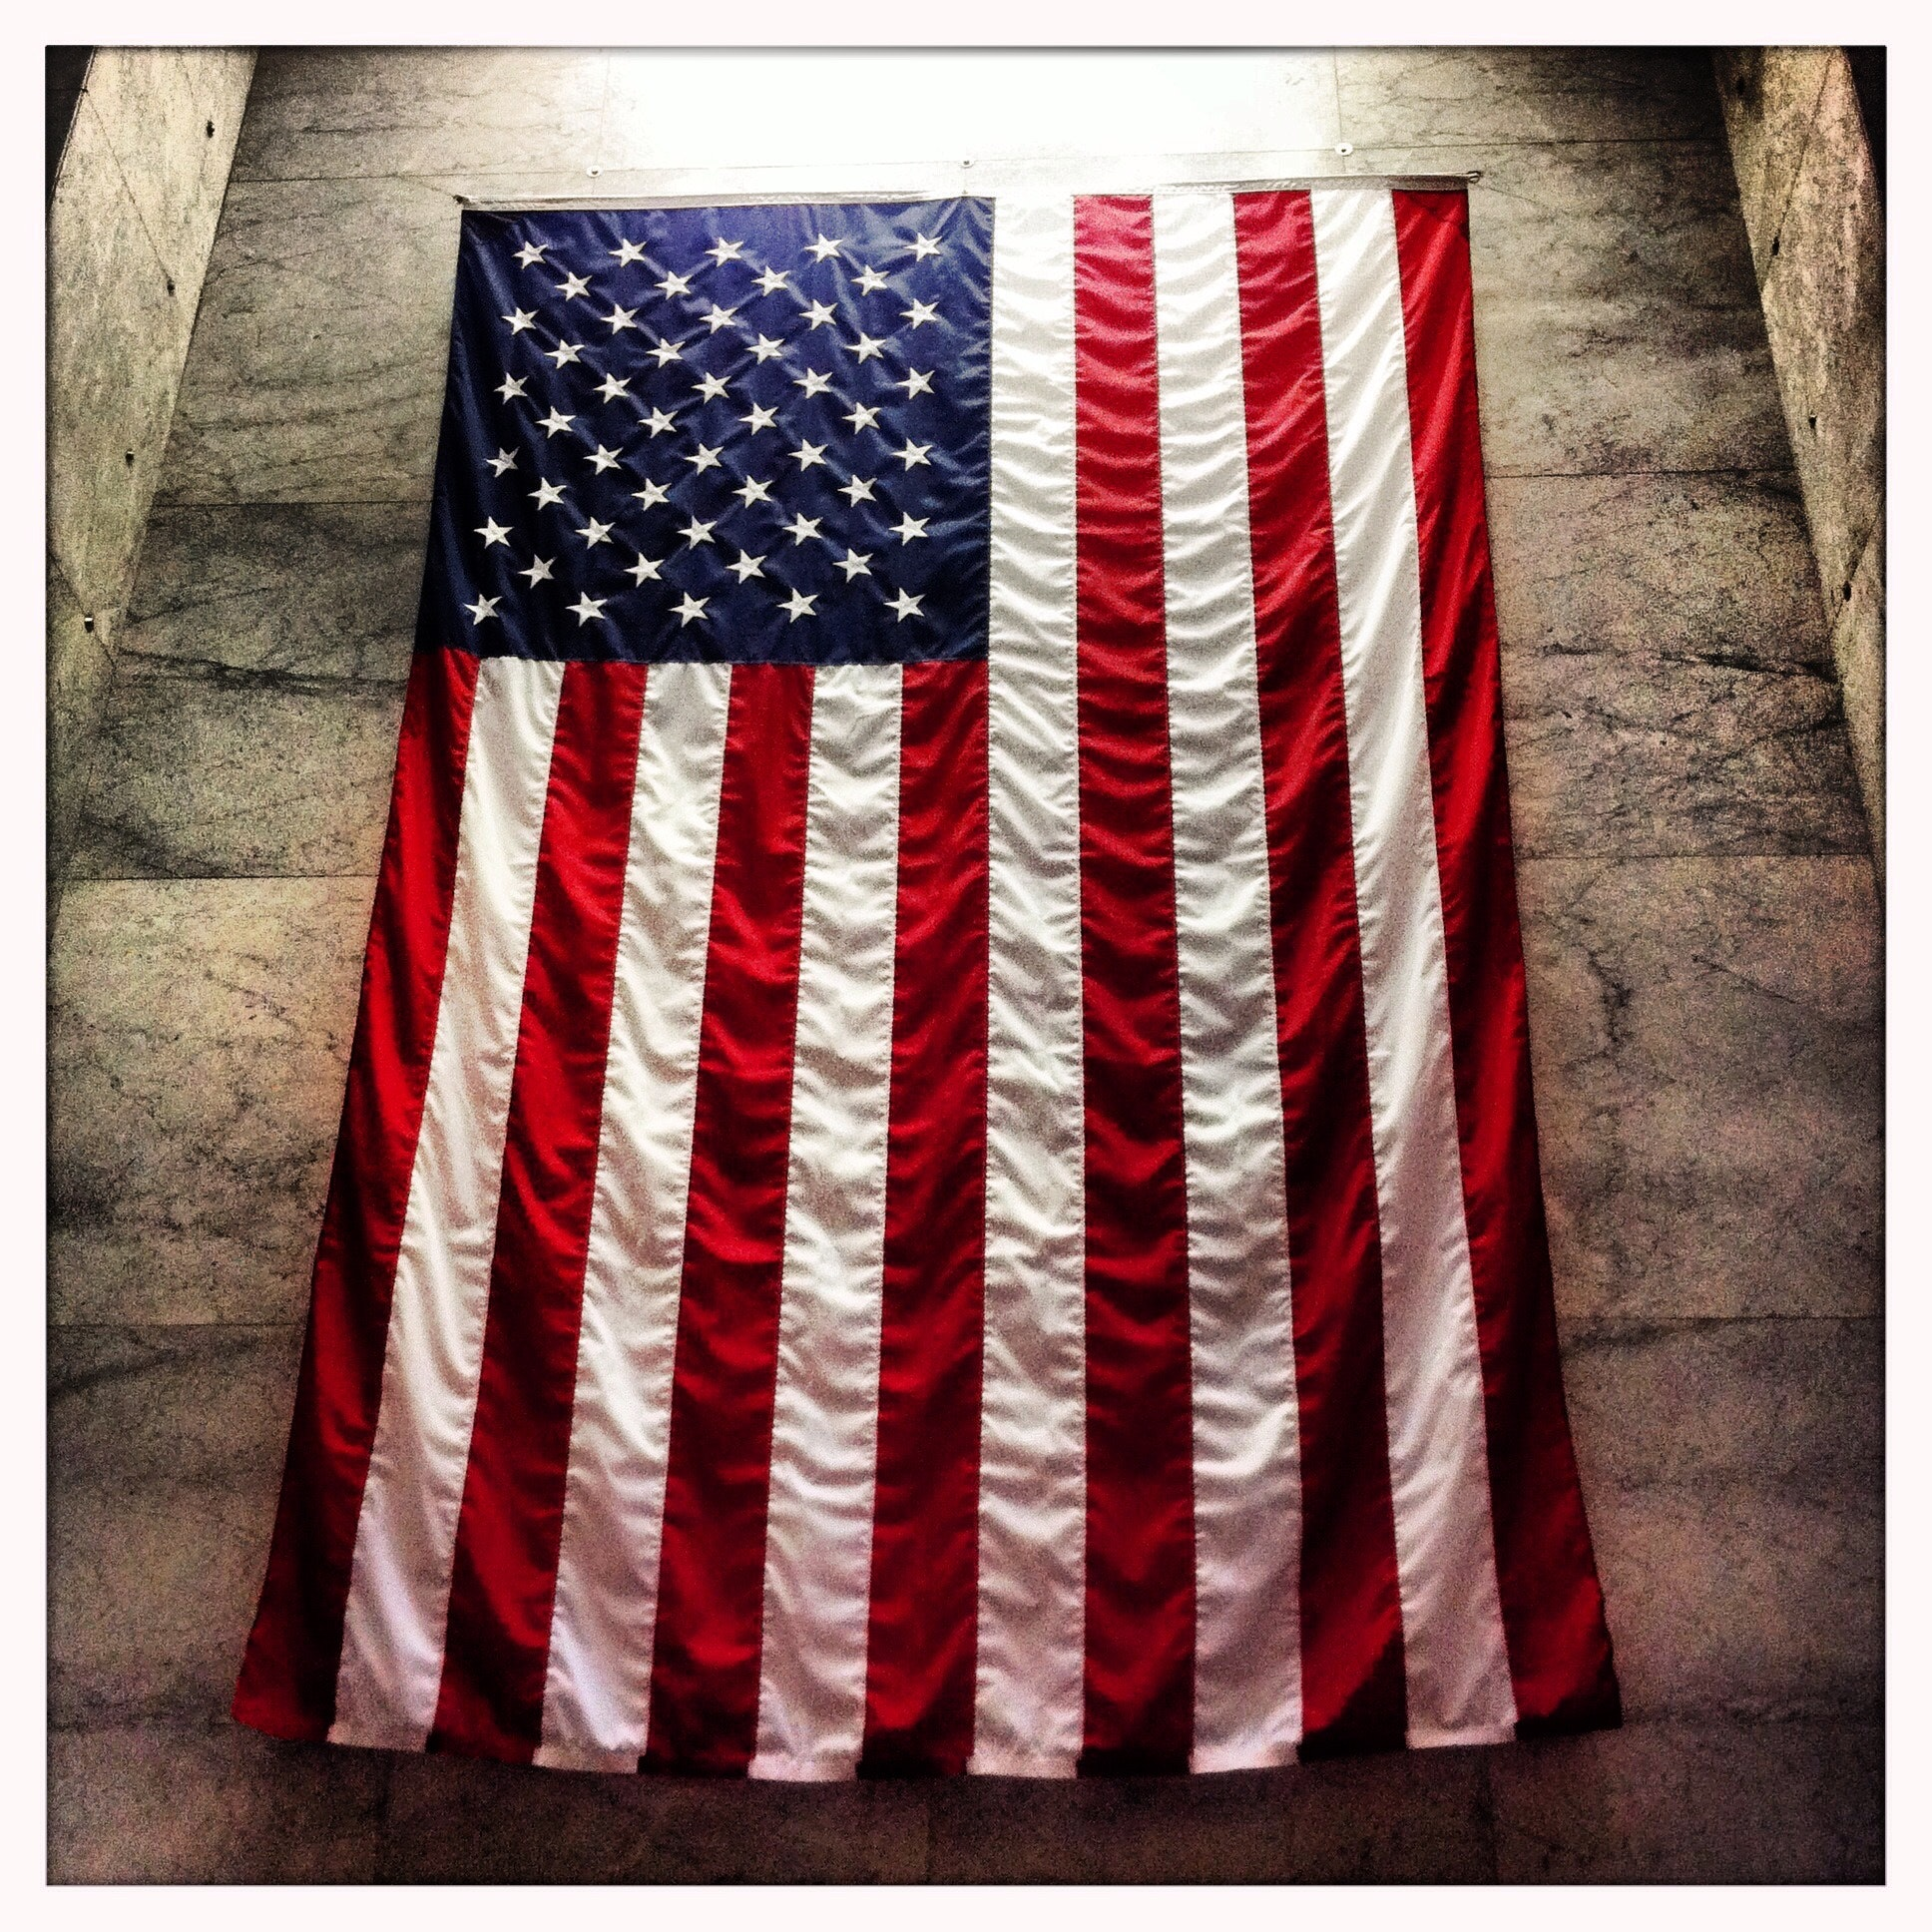 american-flag-close-up-design-560964.jpg